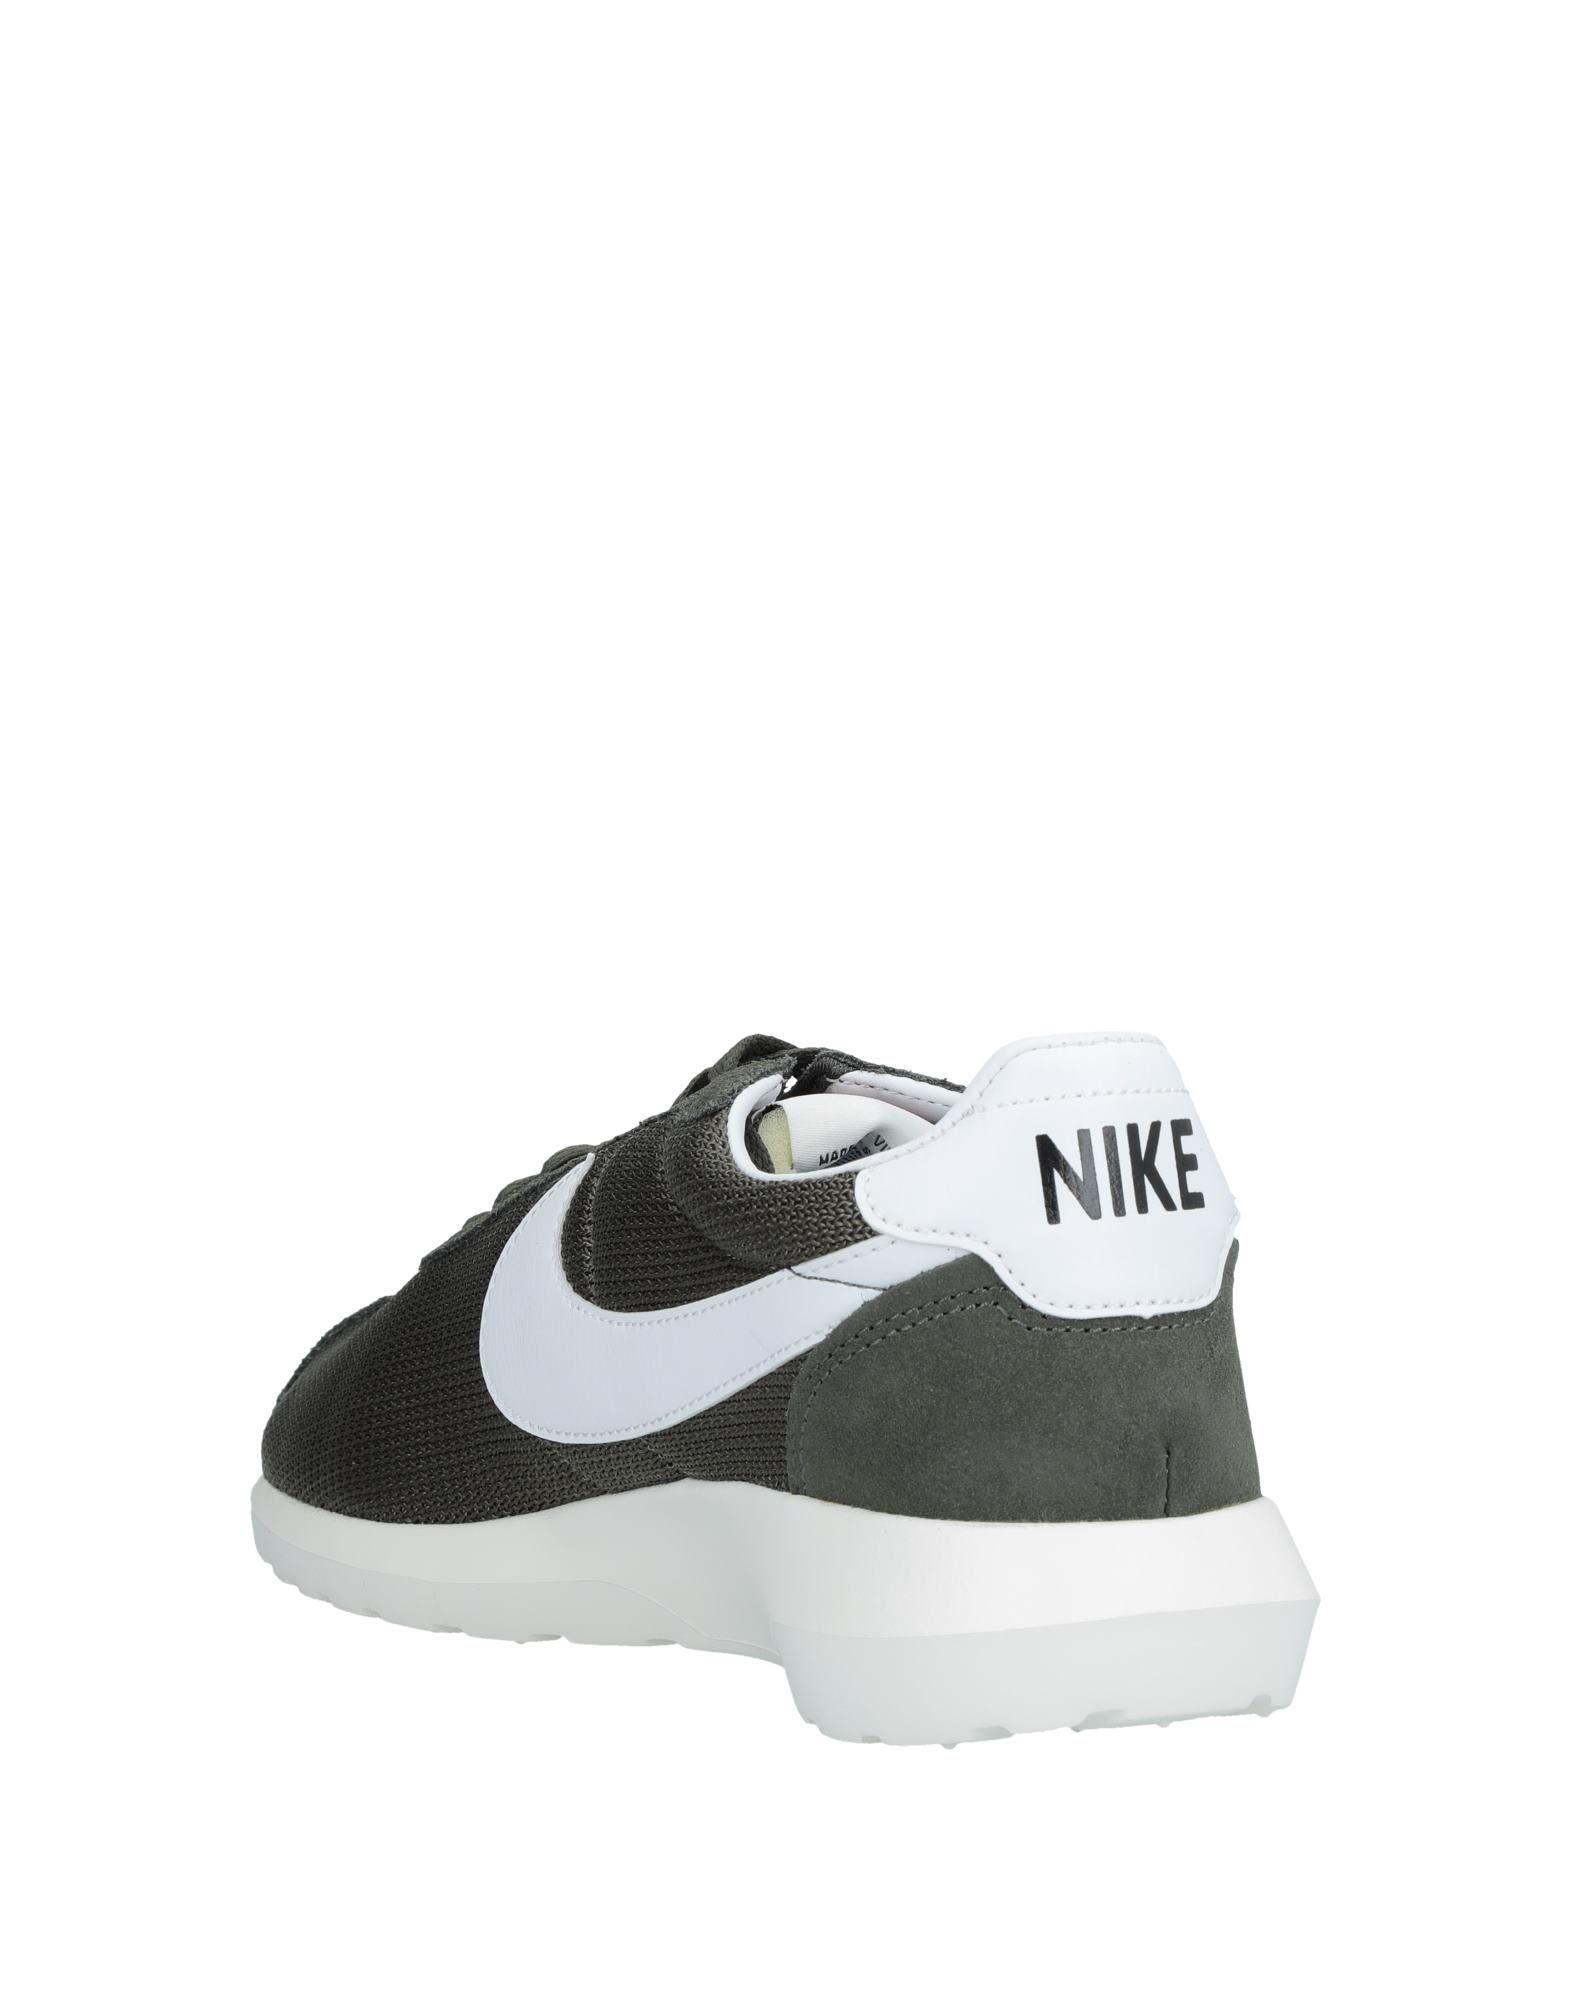 Rabatt Herren echte Schuhe Nike Sneakers Herren Rabatt  11146163TU 8d5f0b